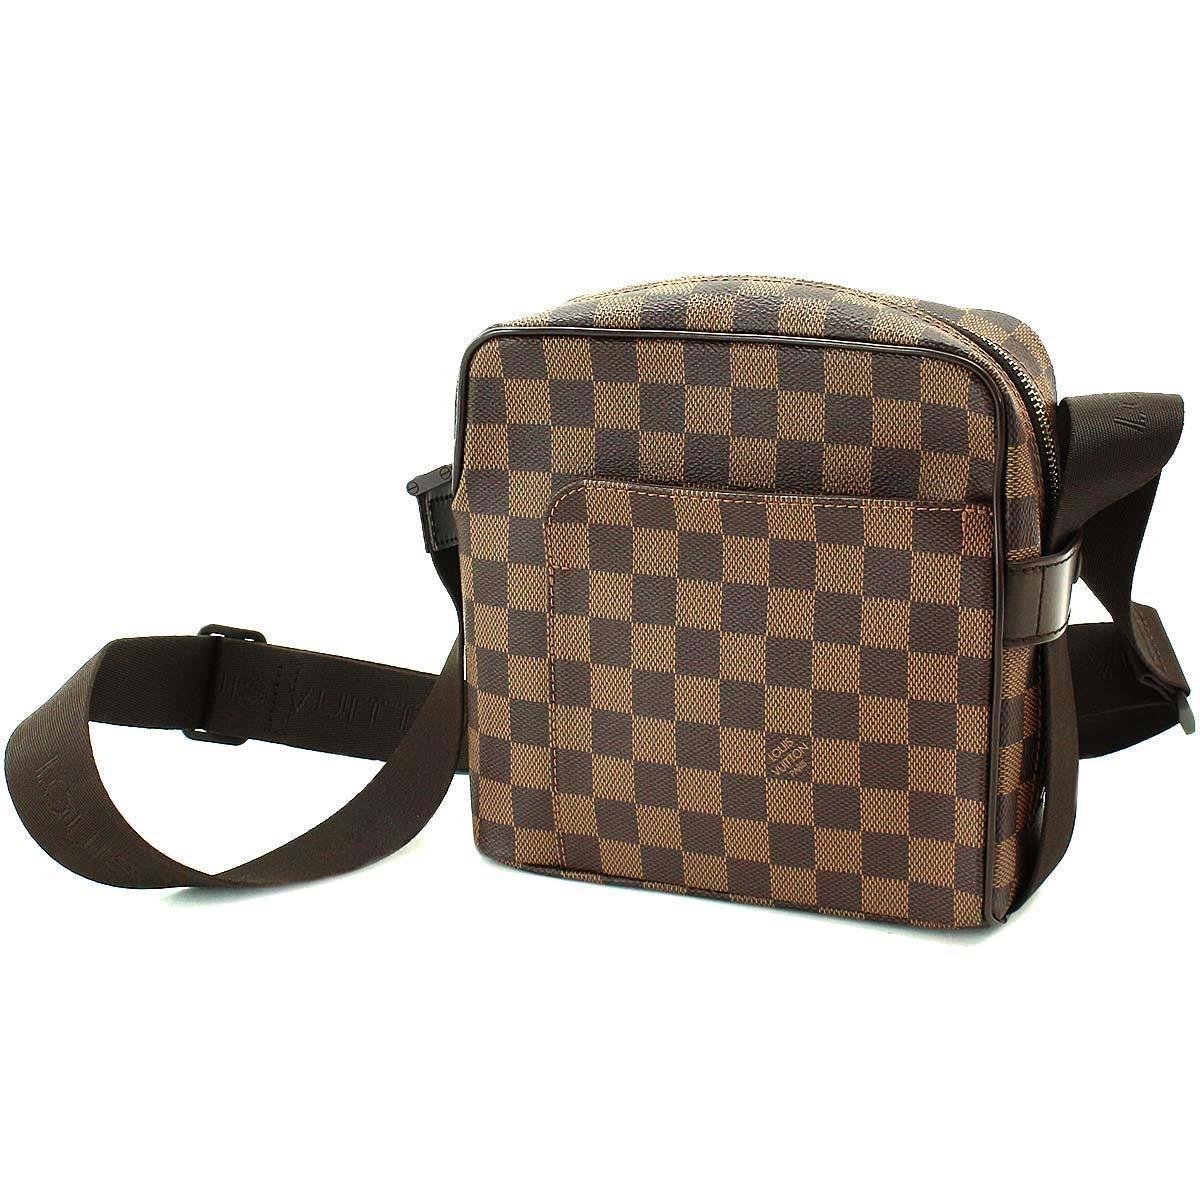 2d8a19e2a93b Lyst - Louis Vuitton Damier Olav Pm Shoulder Bag Ebene Purse N41442 ...